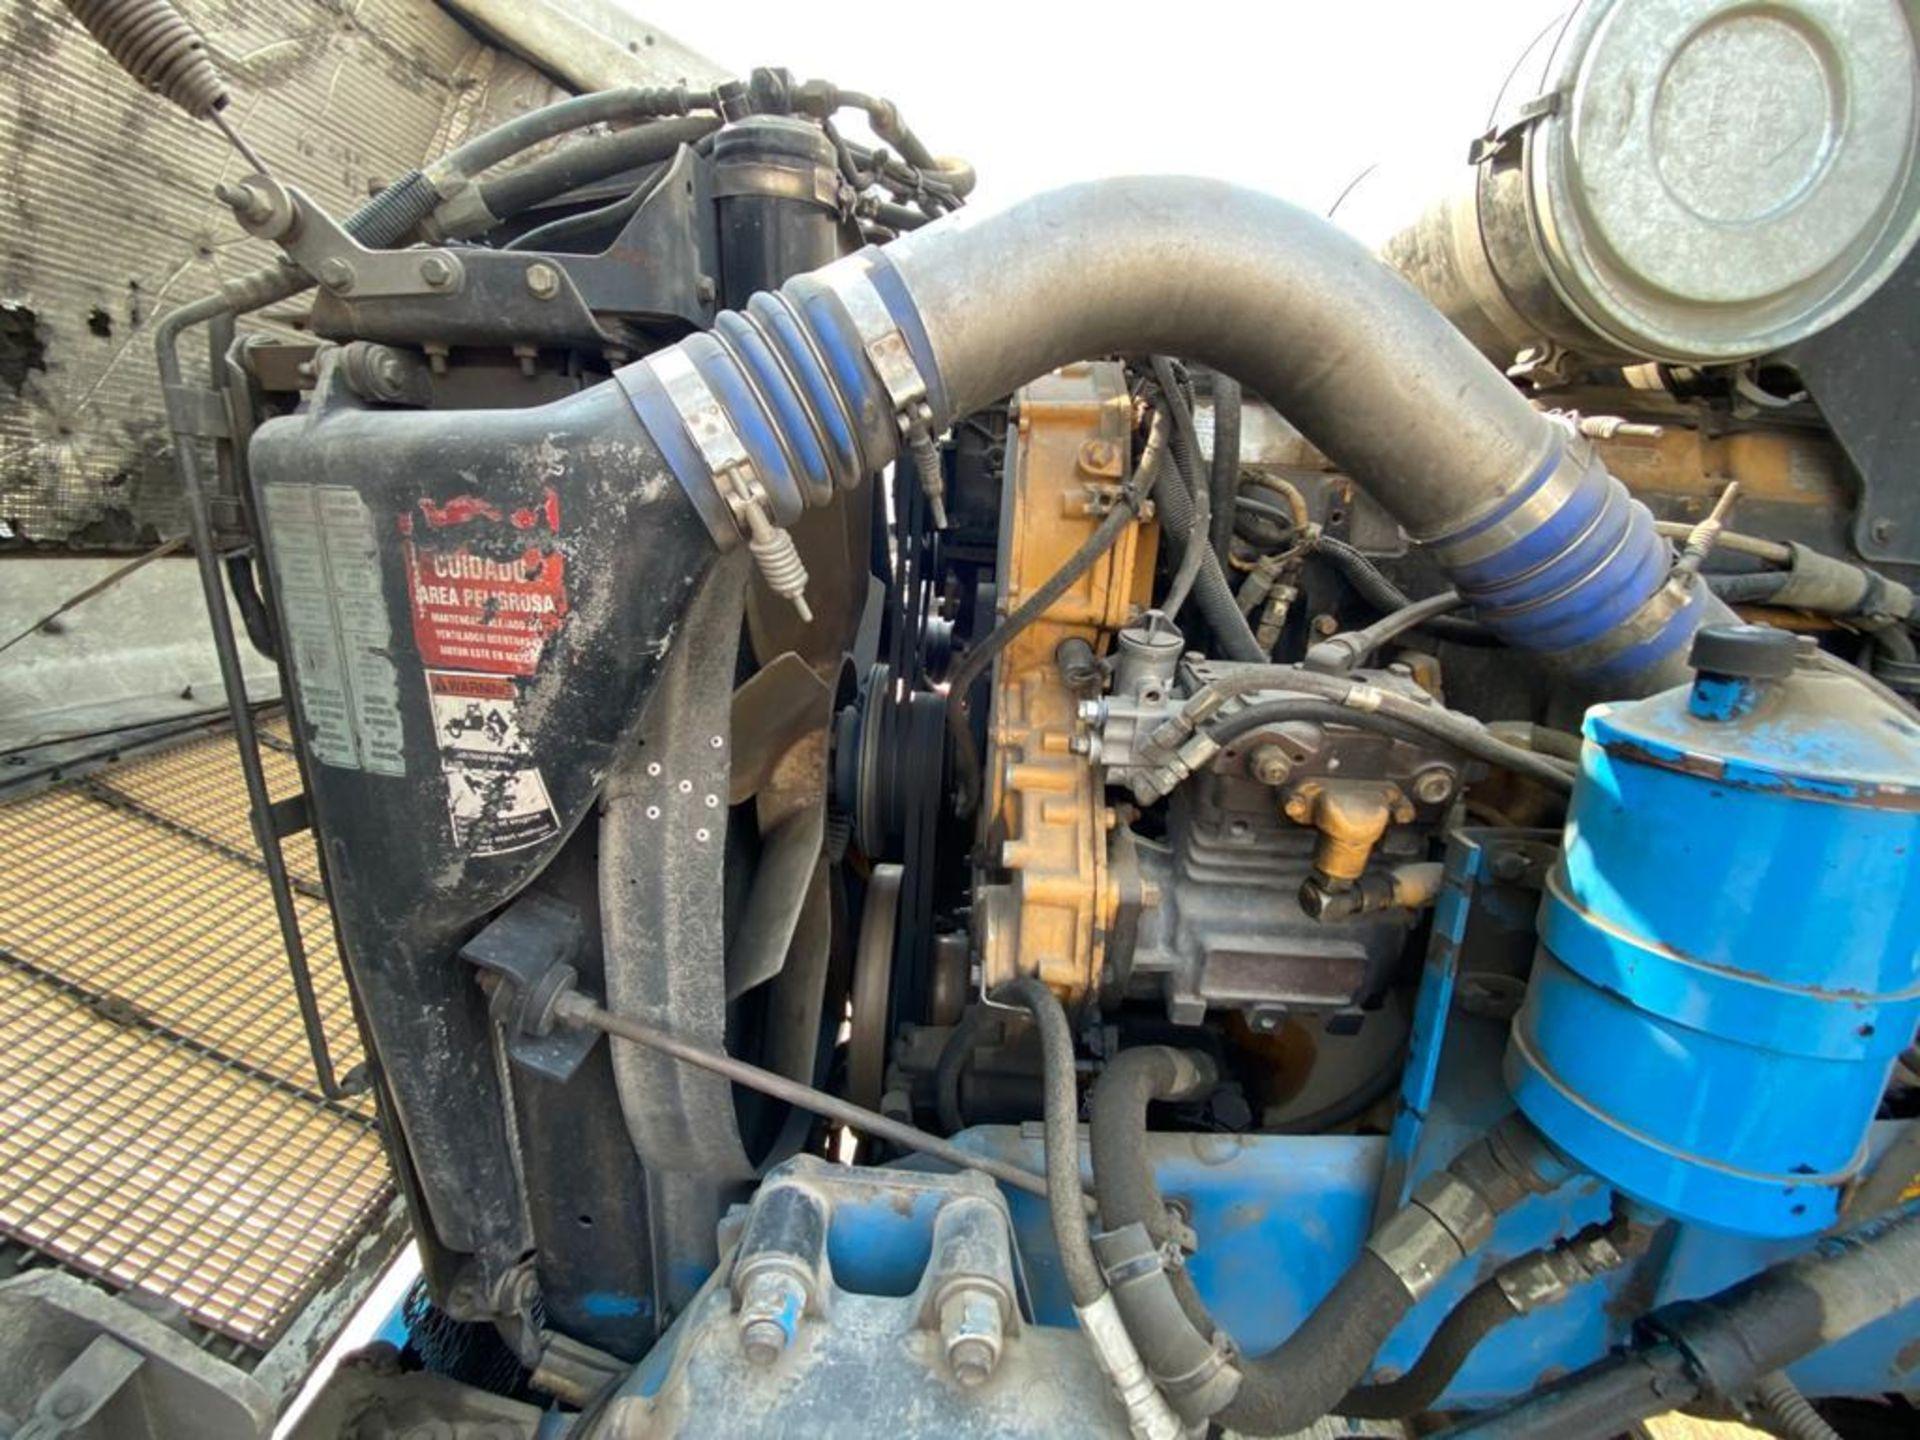 1998 Kenworth Sleeper truck tractor, standard transmission of 18 speeds - Image 68 of 75